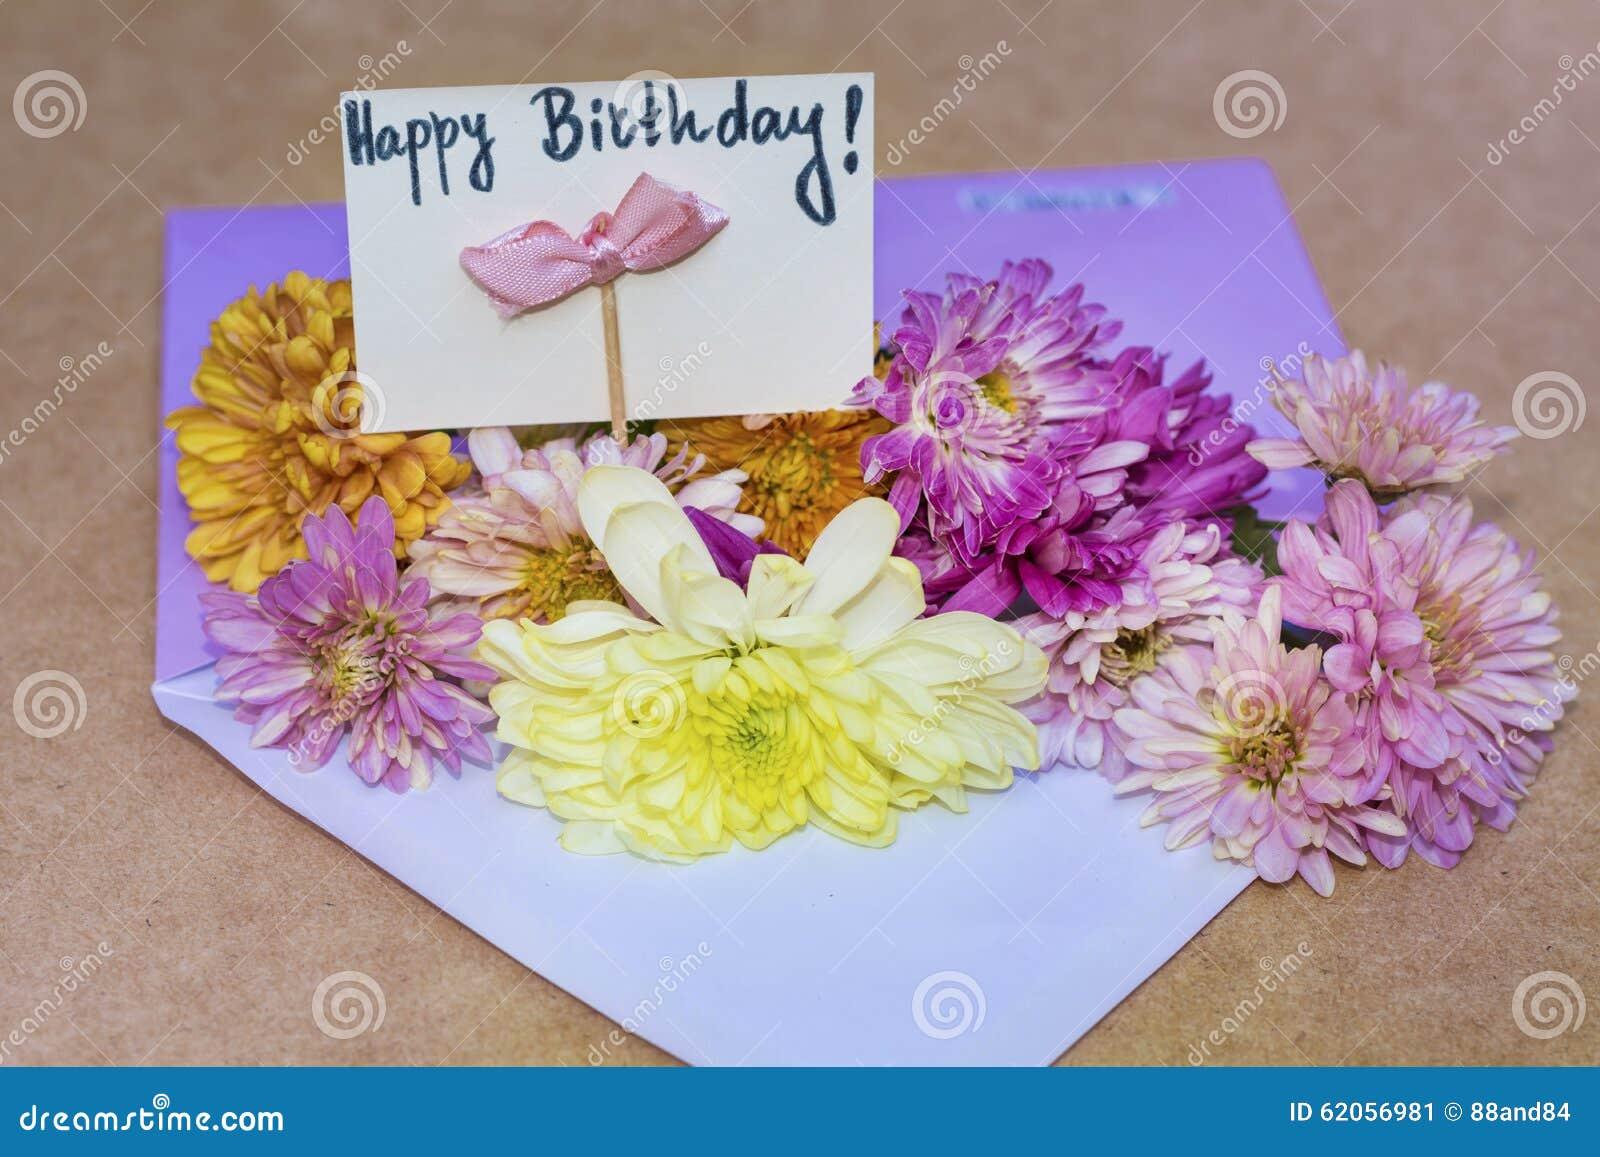 Chrysanthemums flowers in violet envelope with i happy birthday card chrysanthemums flowers in violet envelope with i happy birthday card stock image image of chrysanthemum celebrate 62056981 izmirmasajfo